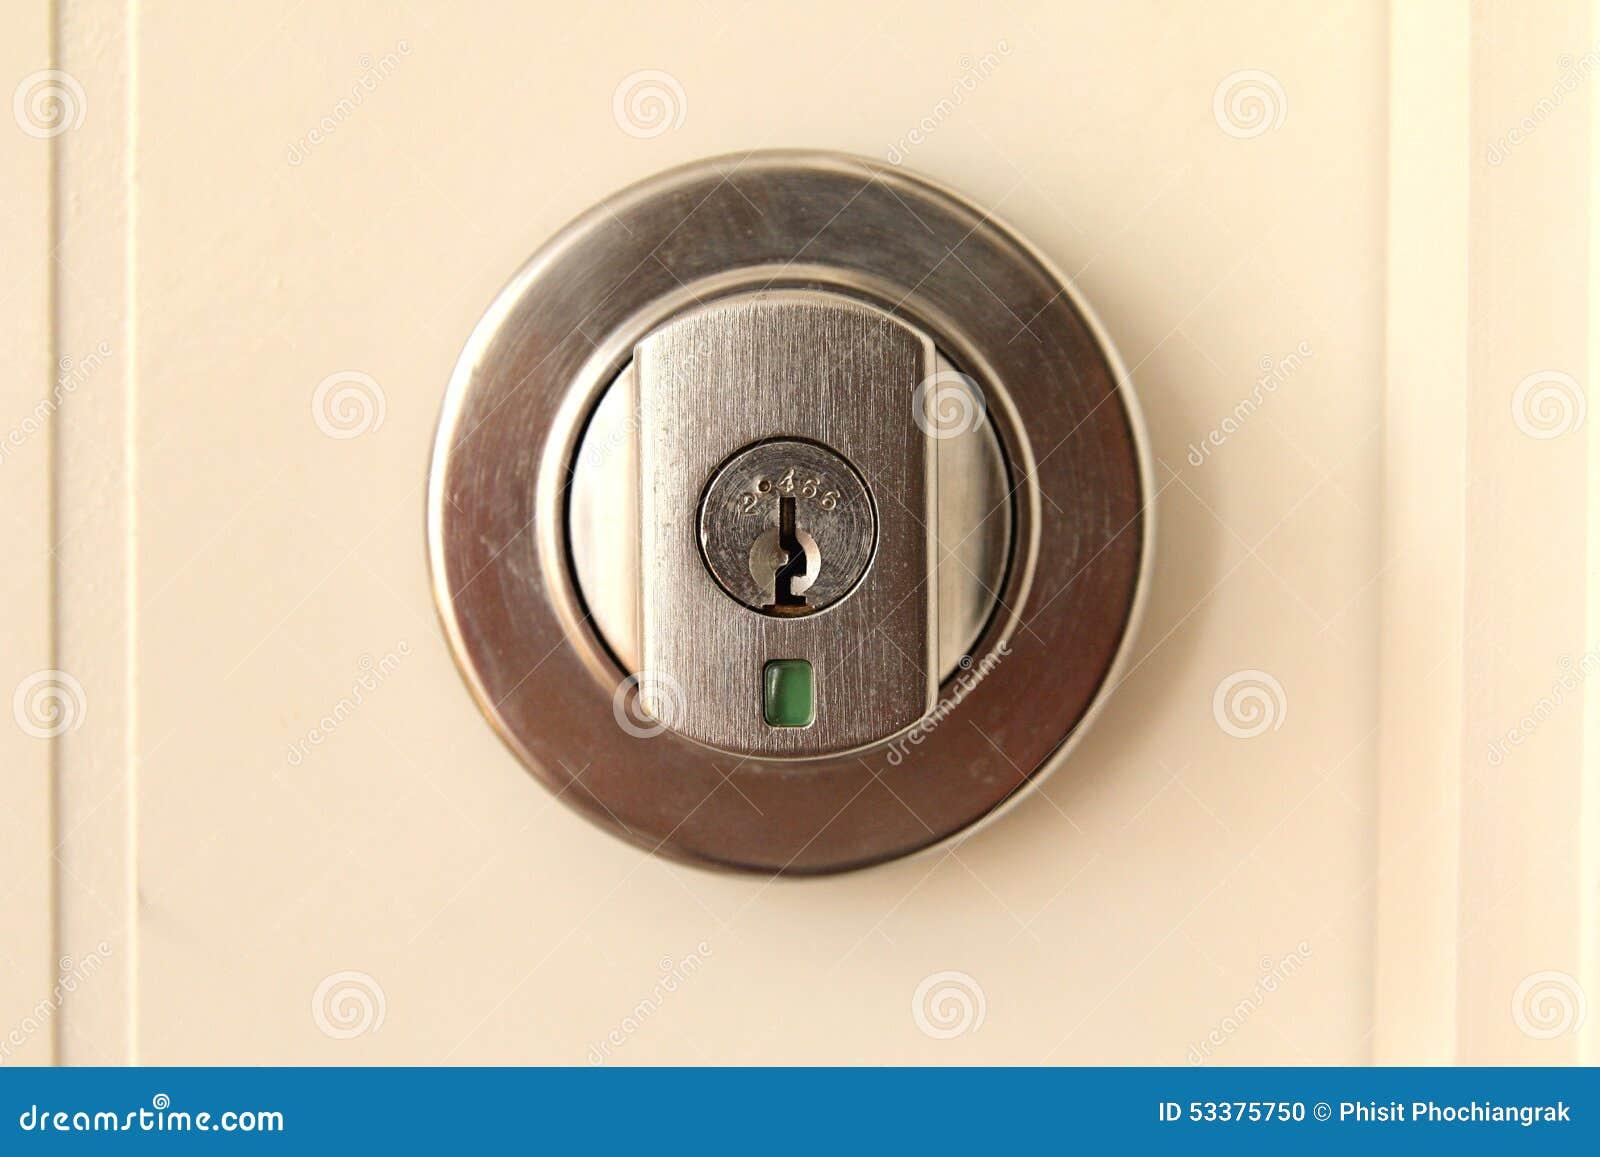 Keyhole door lock & Keyhole door lock stock photo. Image of handle material - 53375750 pezcame.com